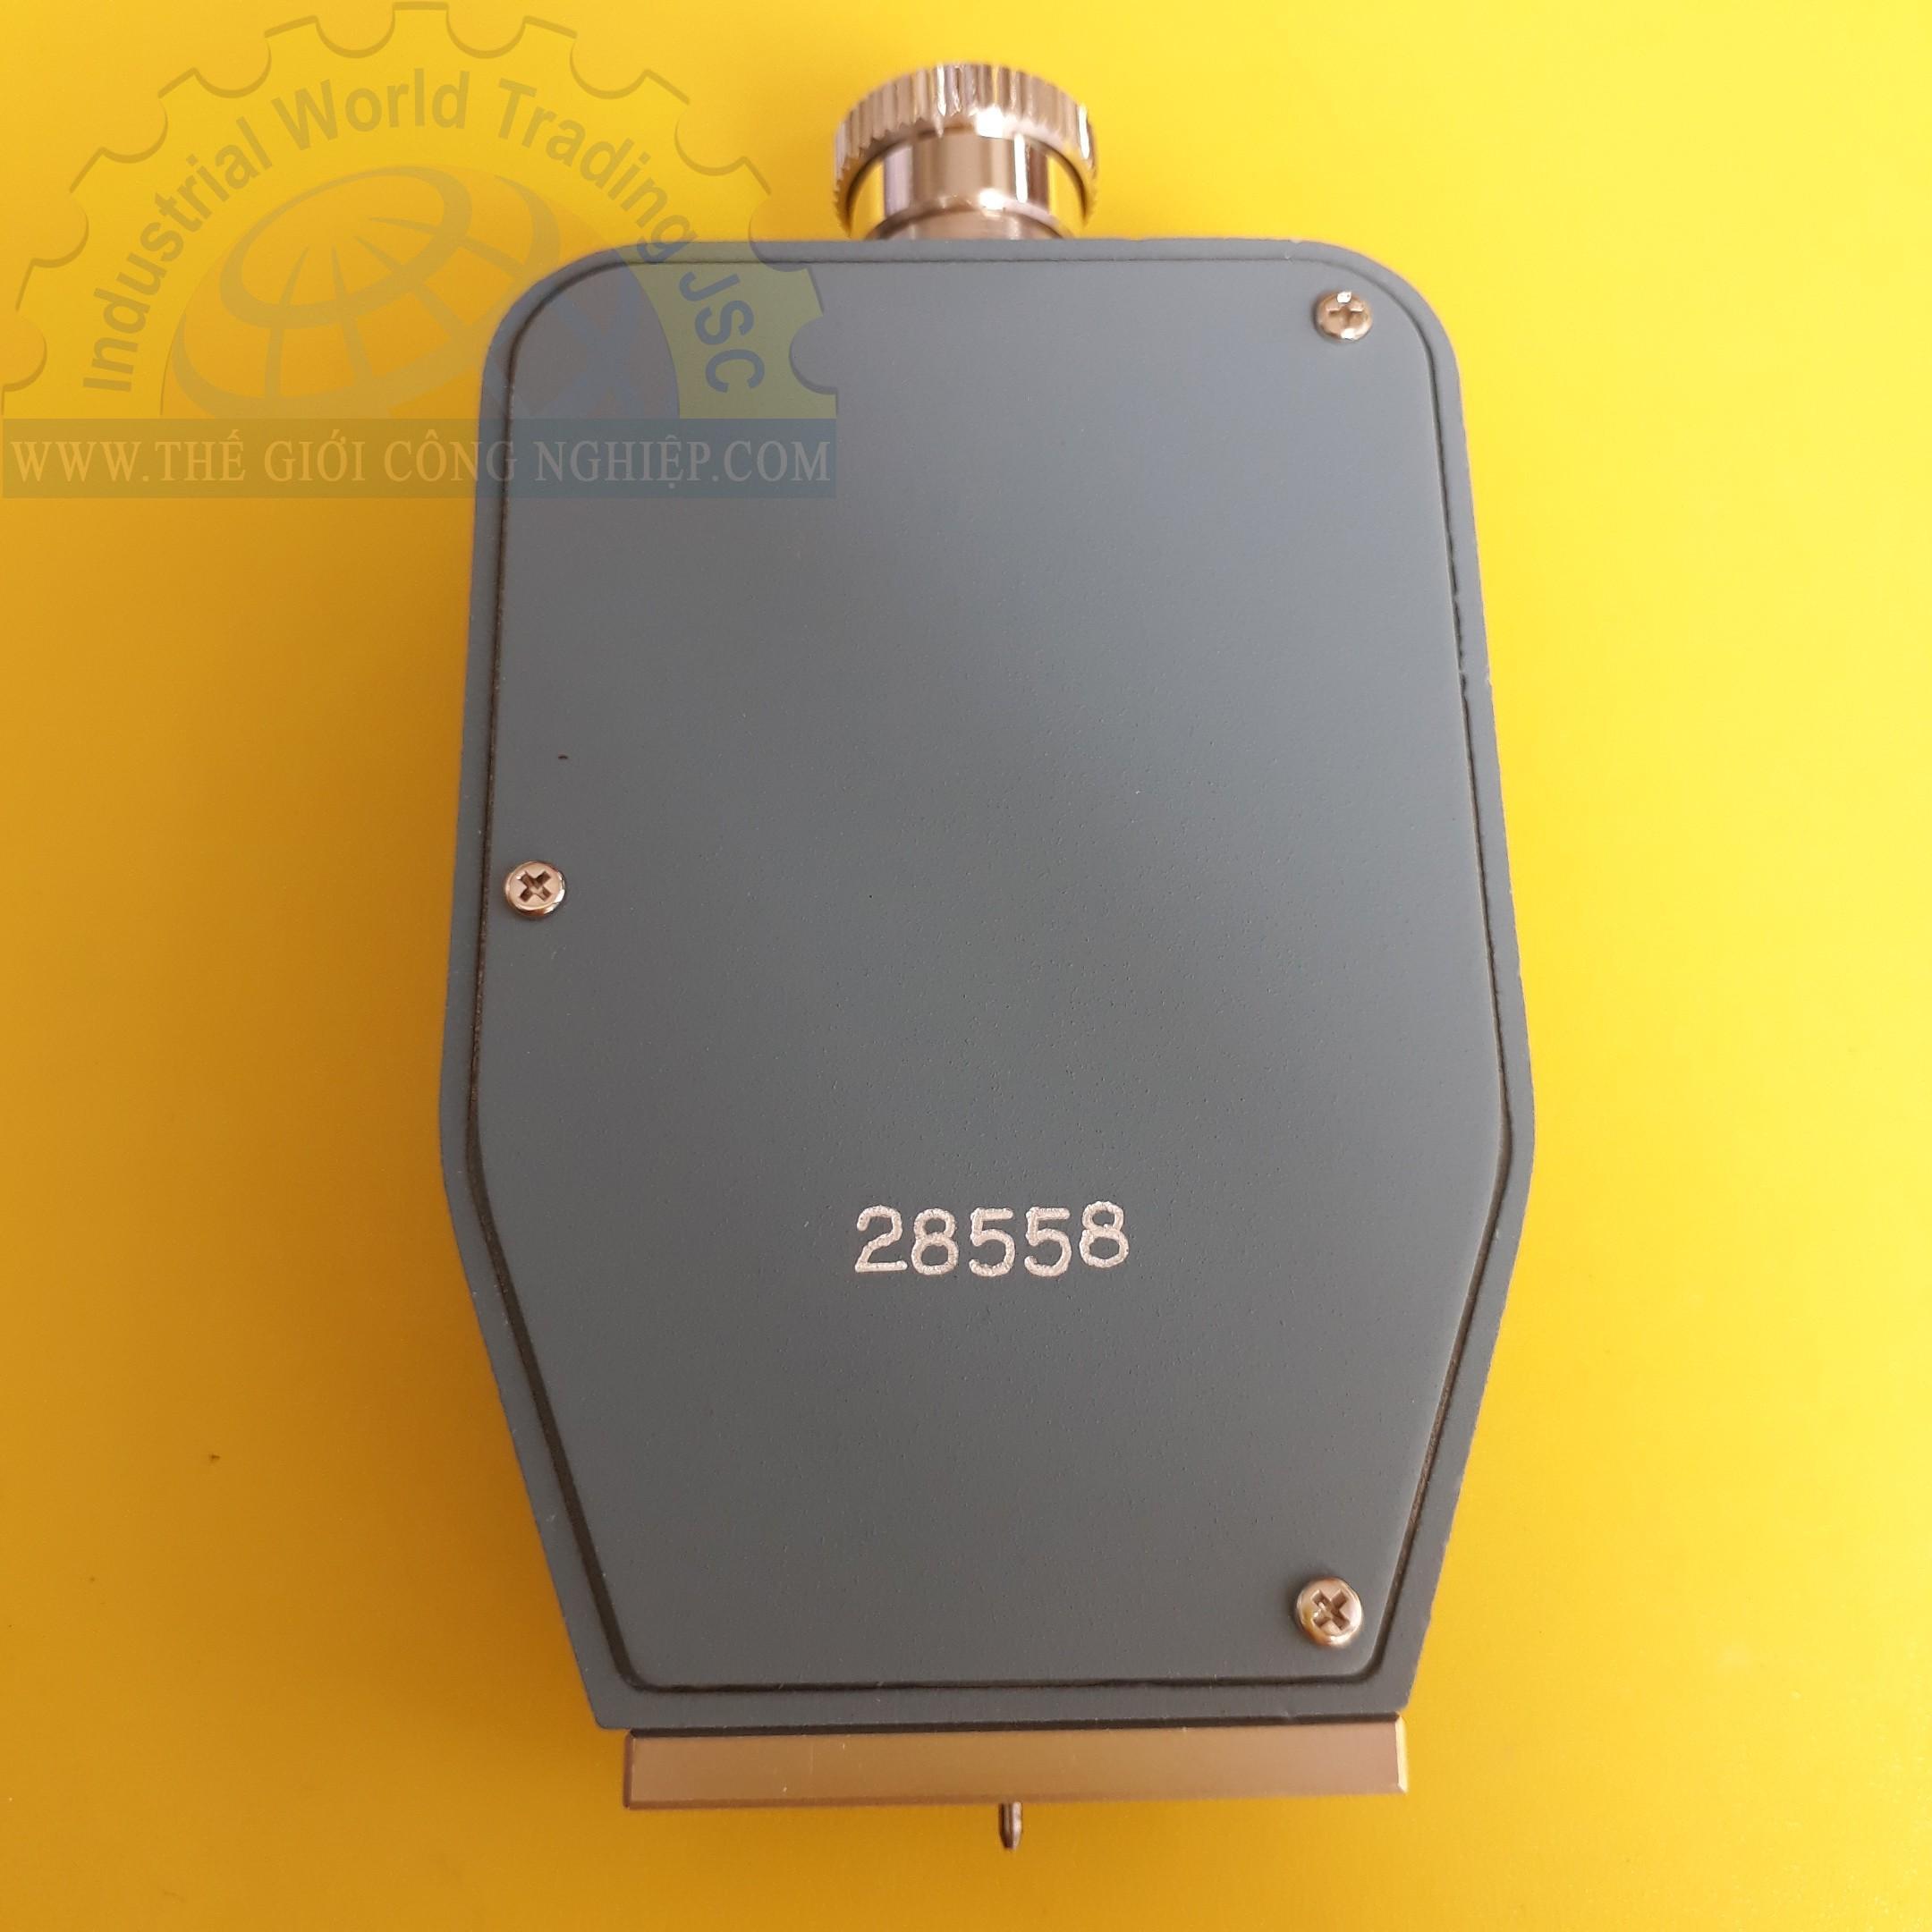 Đồng hồ đo độ cứng cao su loại A  GS-706N Teclock